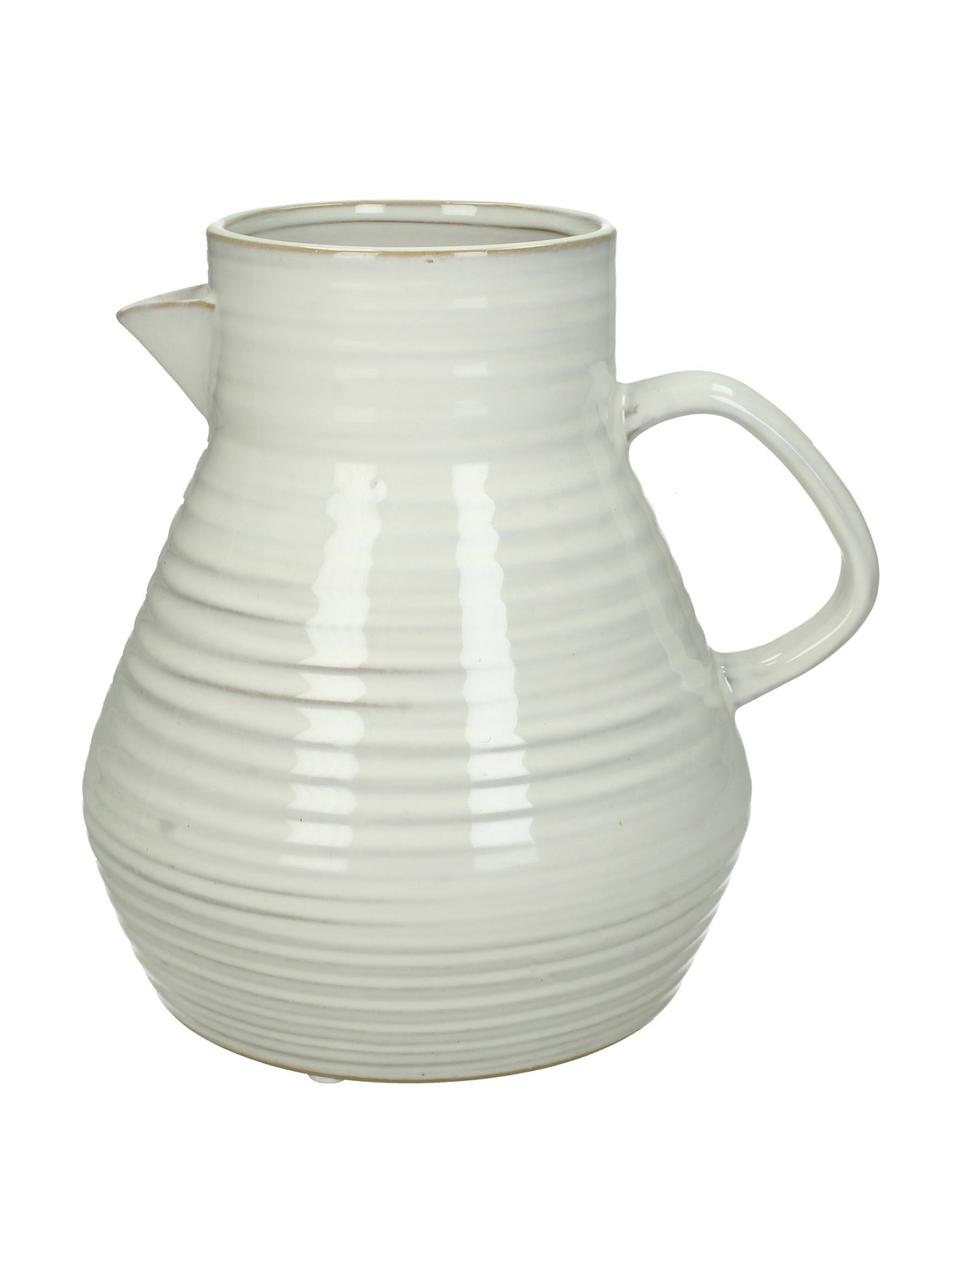 Karaf-vaas Pitcher van keramiek, Keramiek, Gebroken wit, beige, 20 x 20 cm